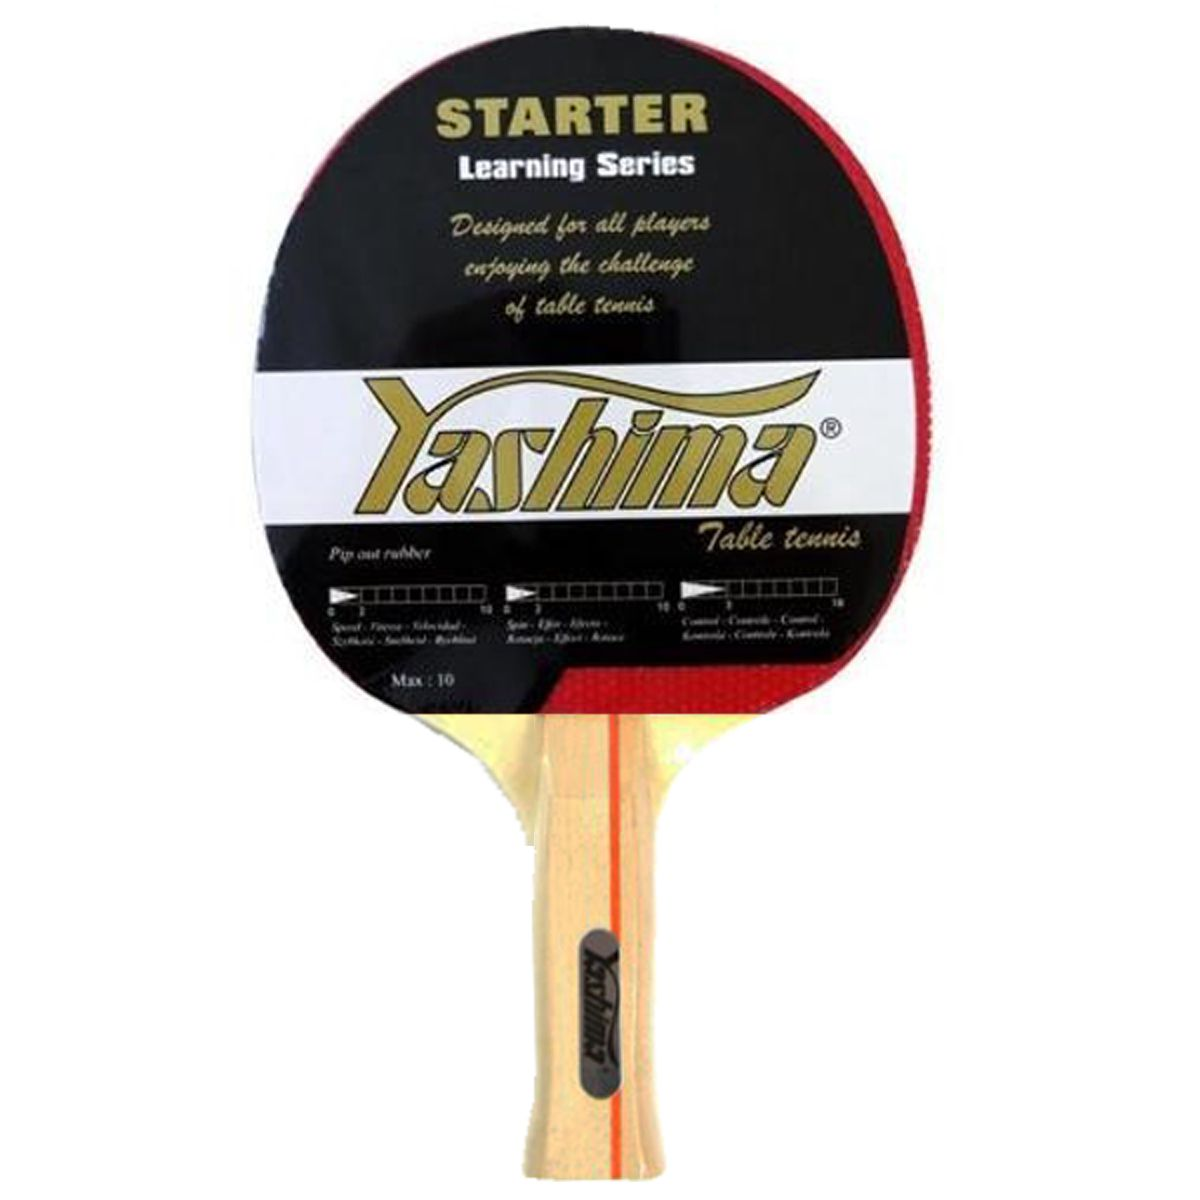 Raquete Tenis de Mesa Yashima Starter Learning Series 9421